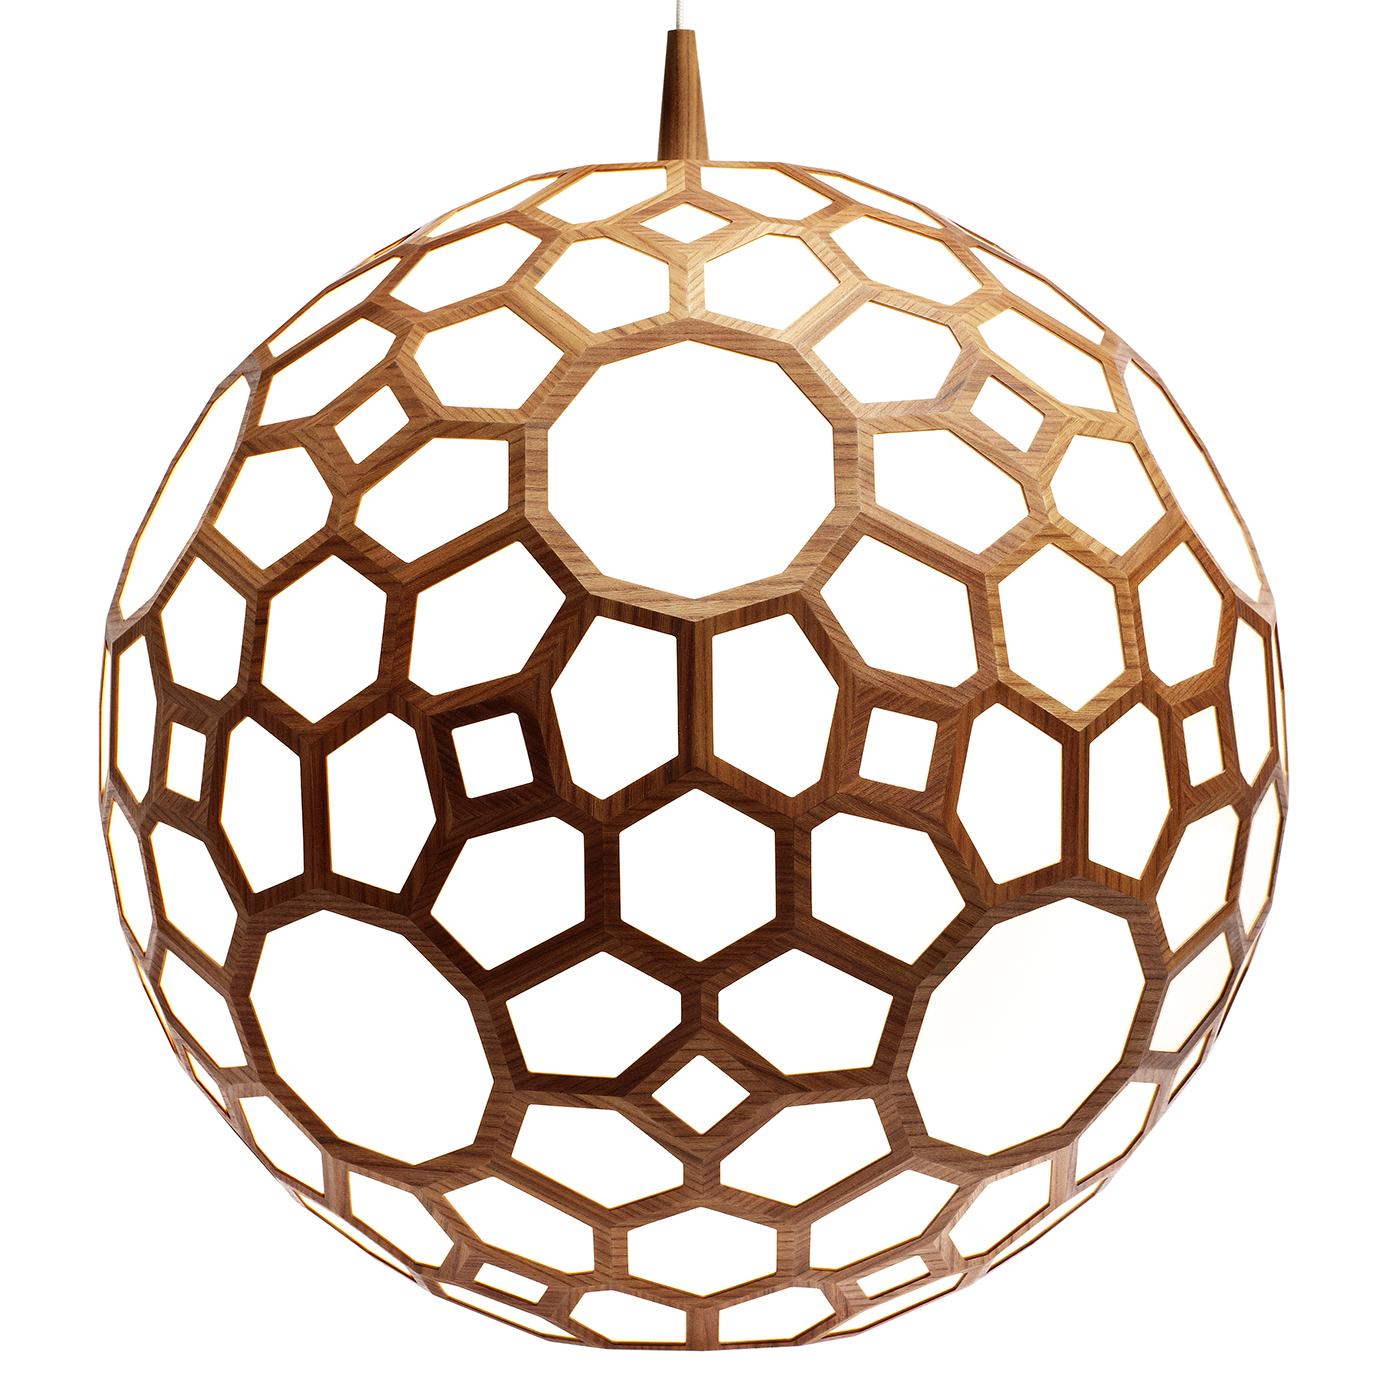 Hikari - Contrahedron